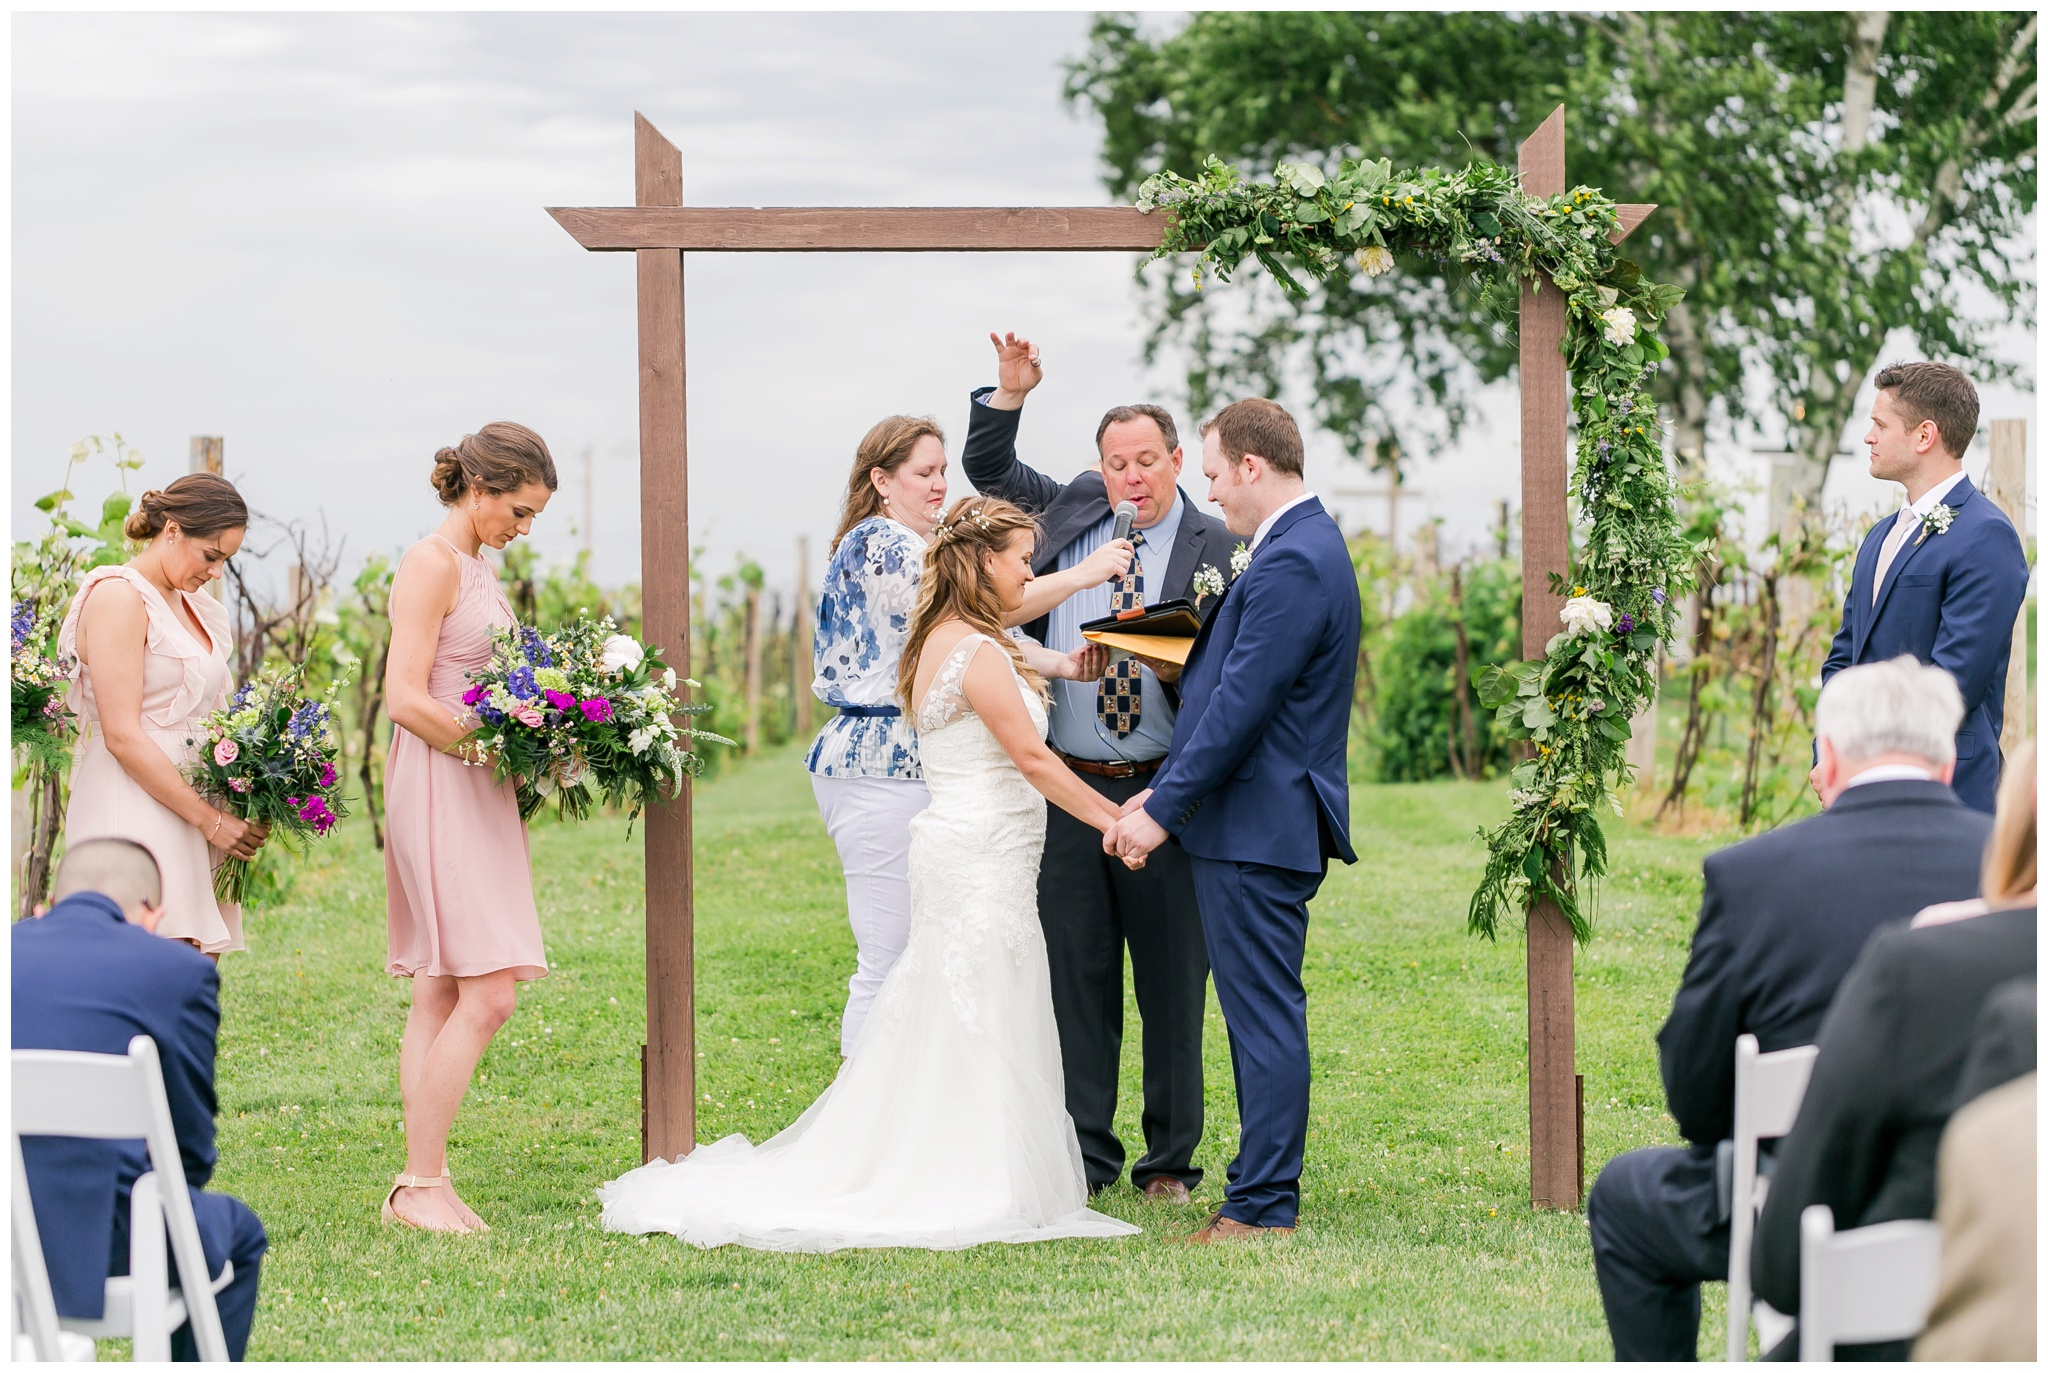 over_the_vines_wedding_edgerton_wisconsin_wedding_caynay_photo_4031.jpg